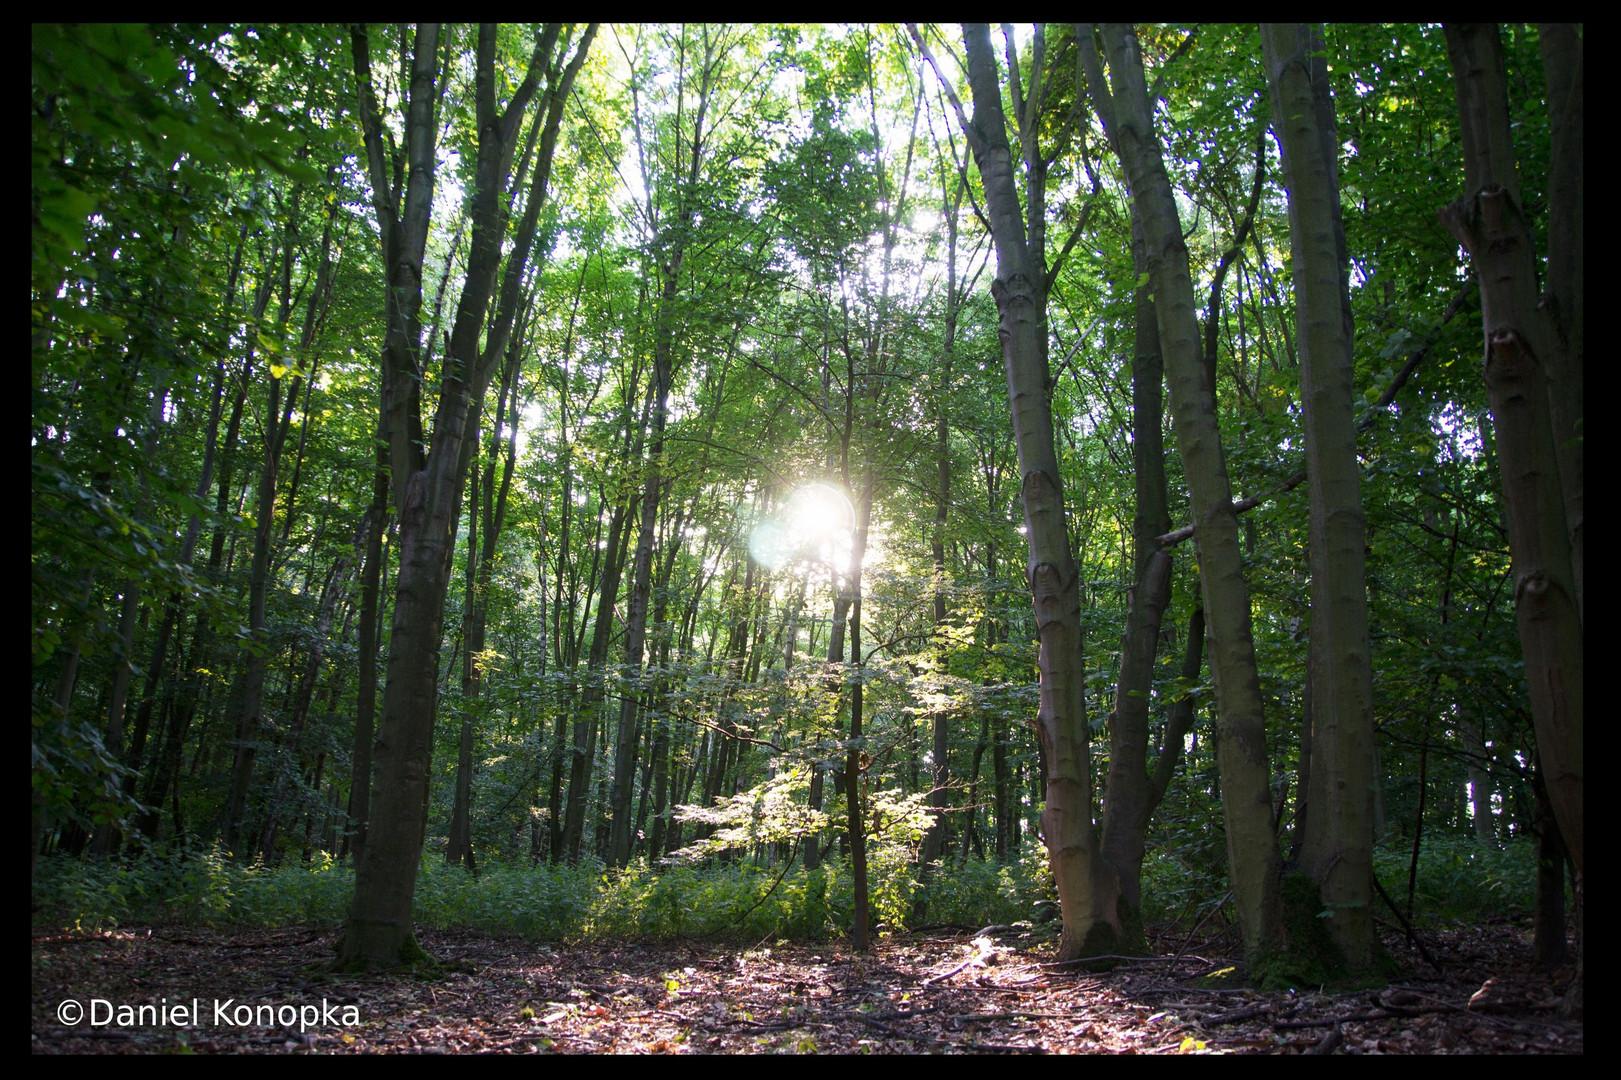 Wald am Abend